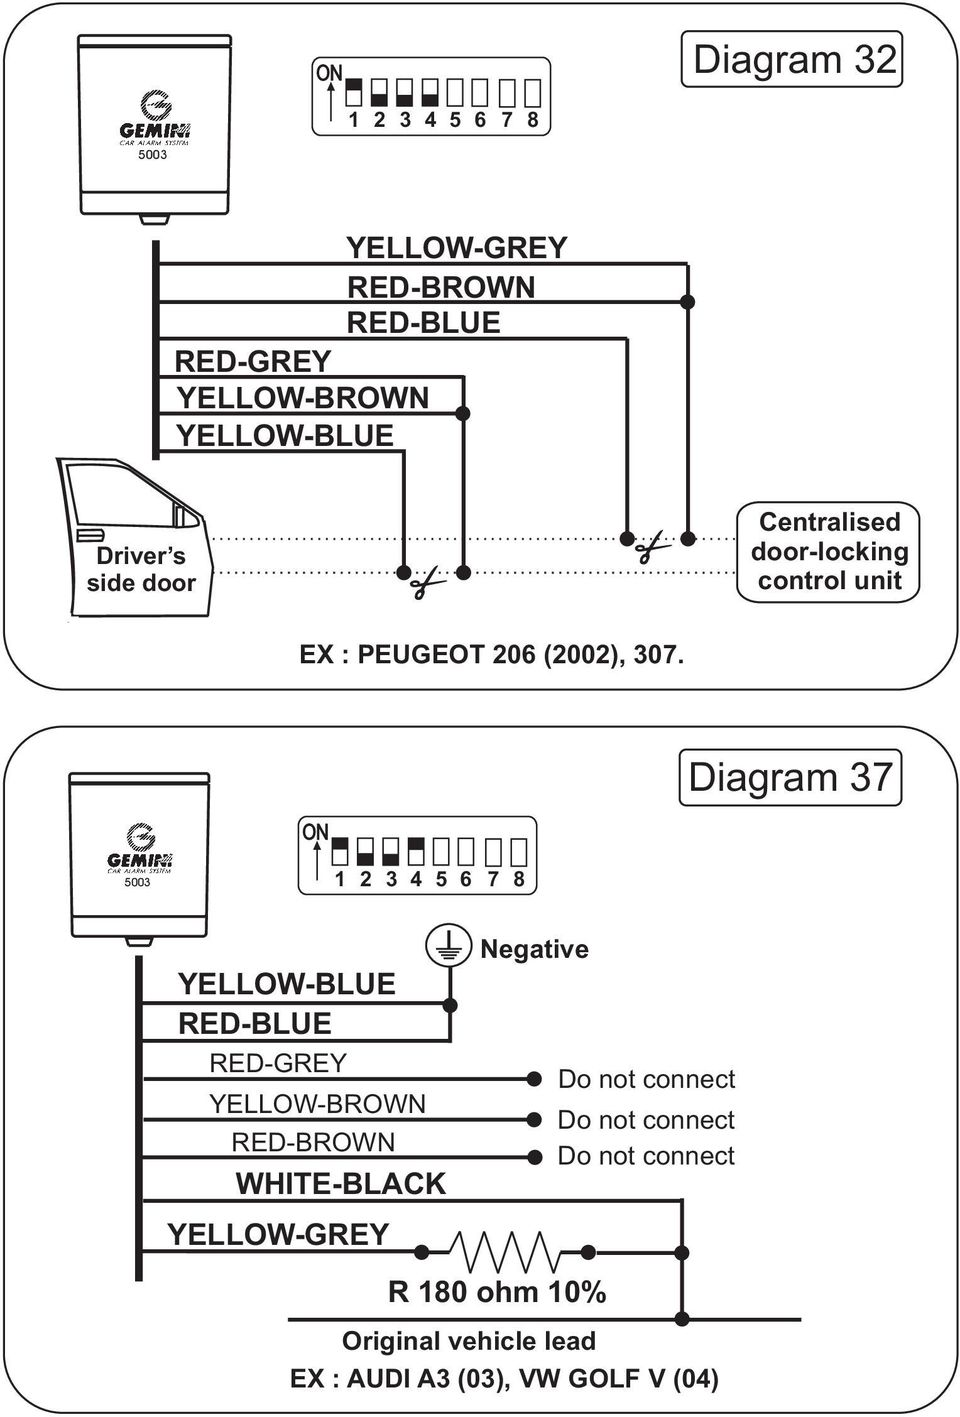 medium resolution of  2002 307 5002 3 installation instructions pdf 2002 307 skoda fabia central locking wiring diagram